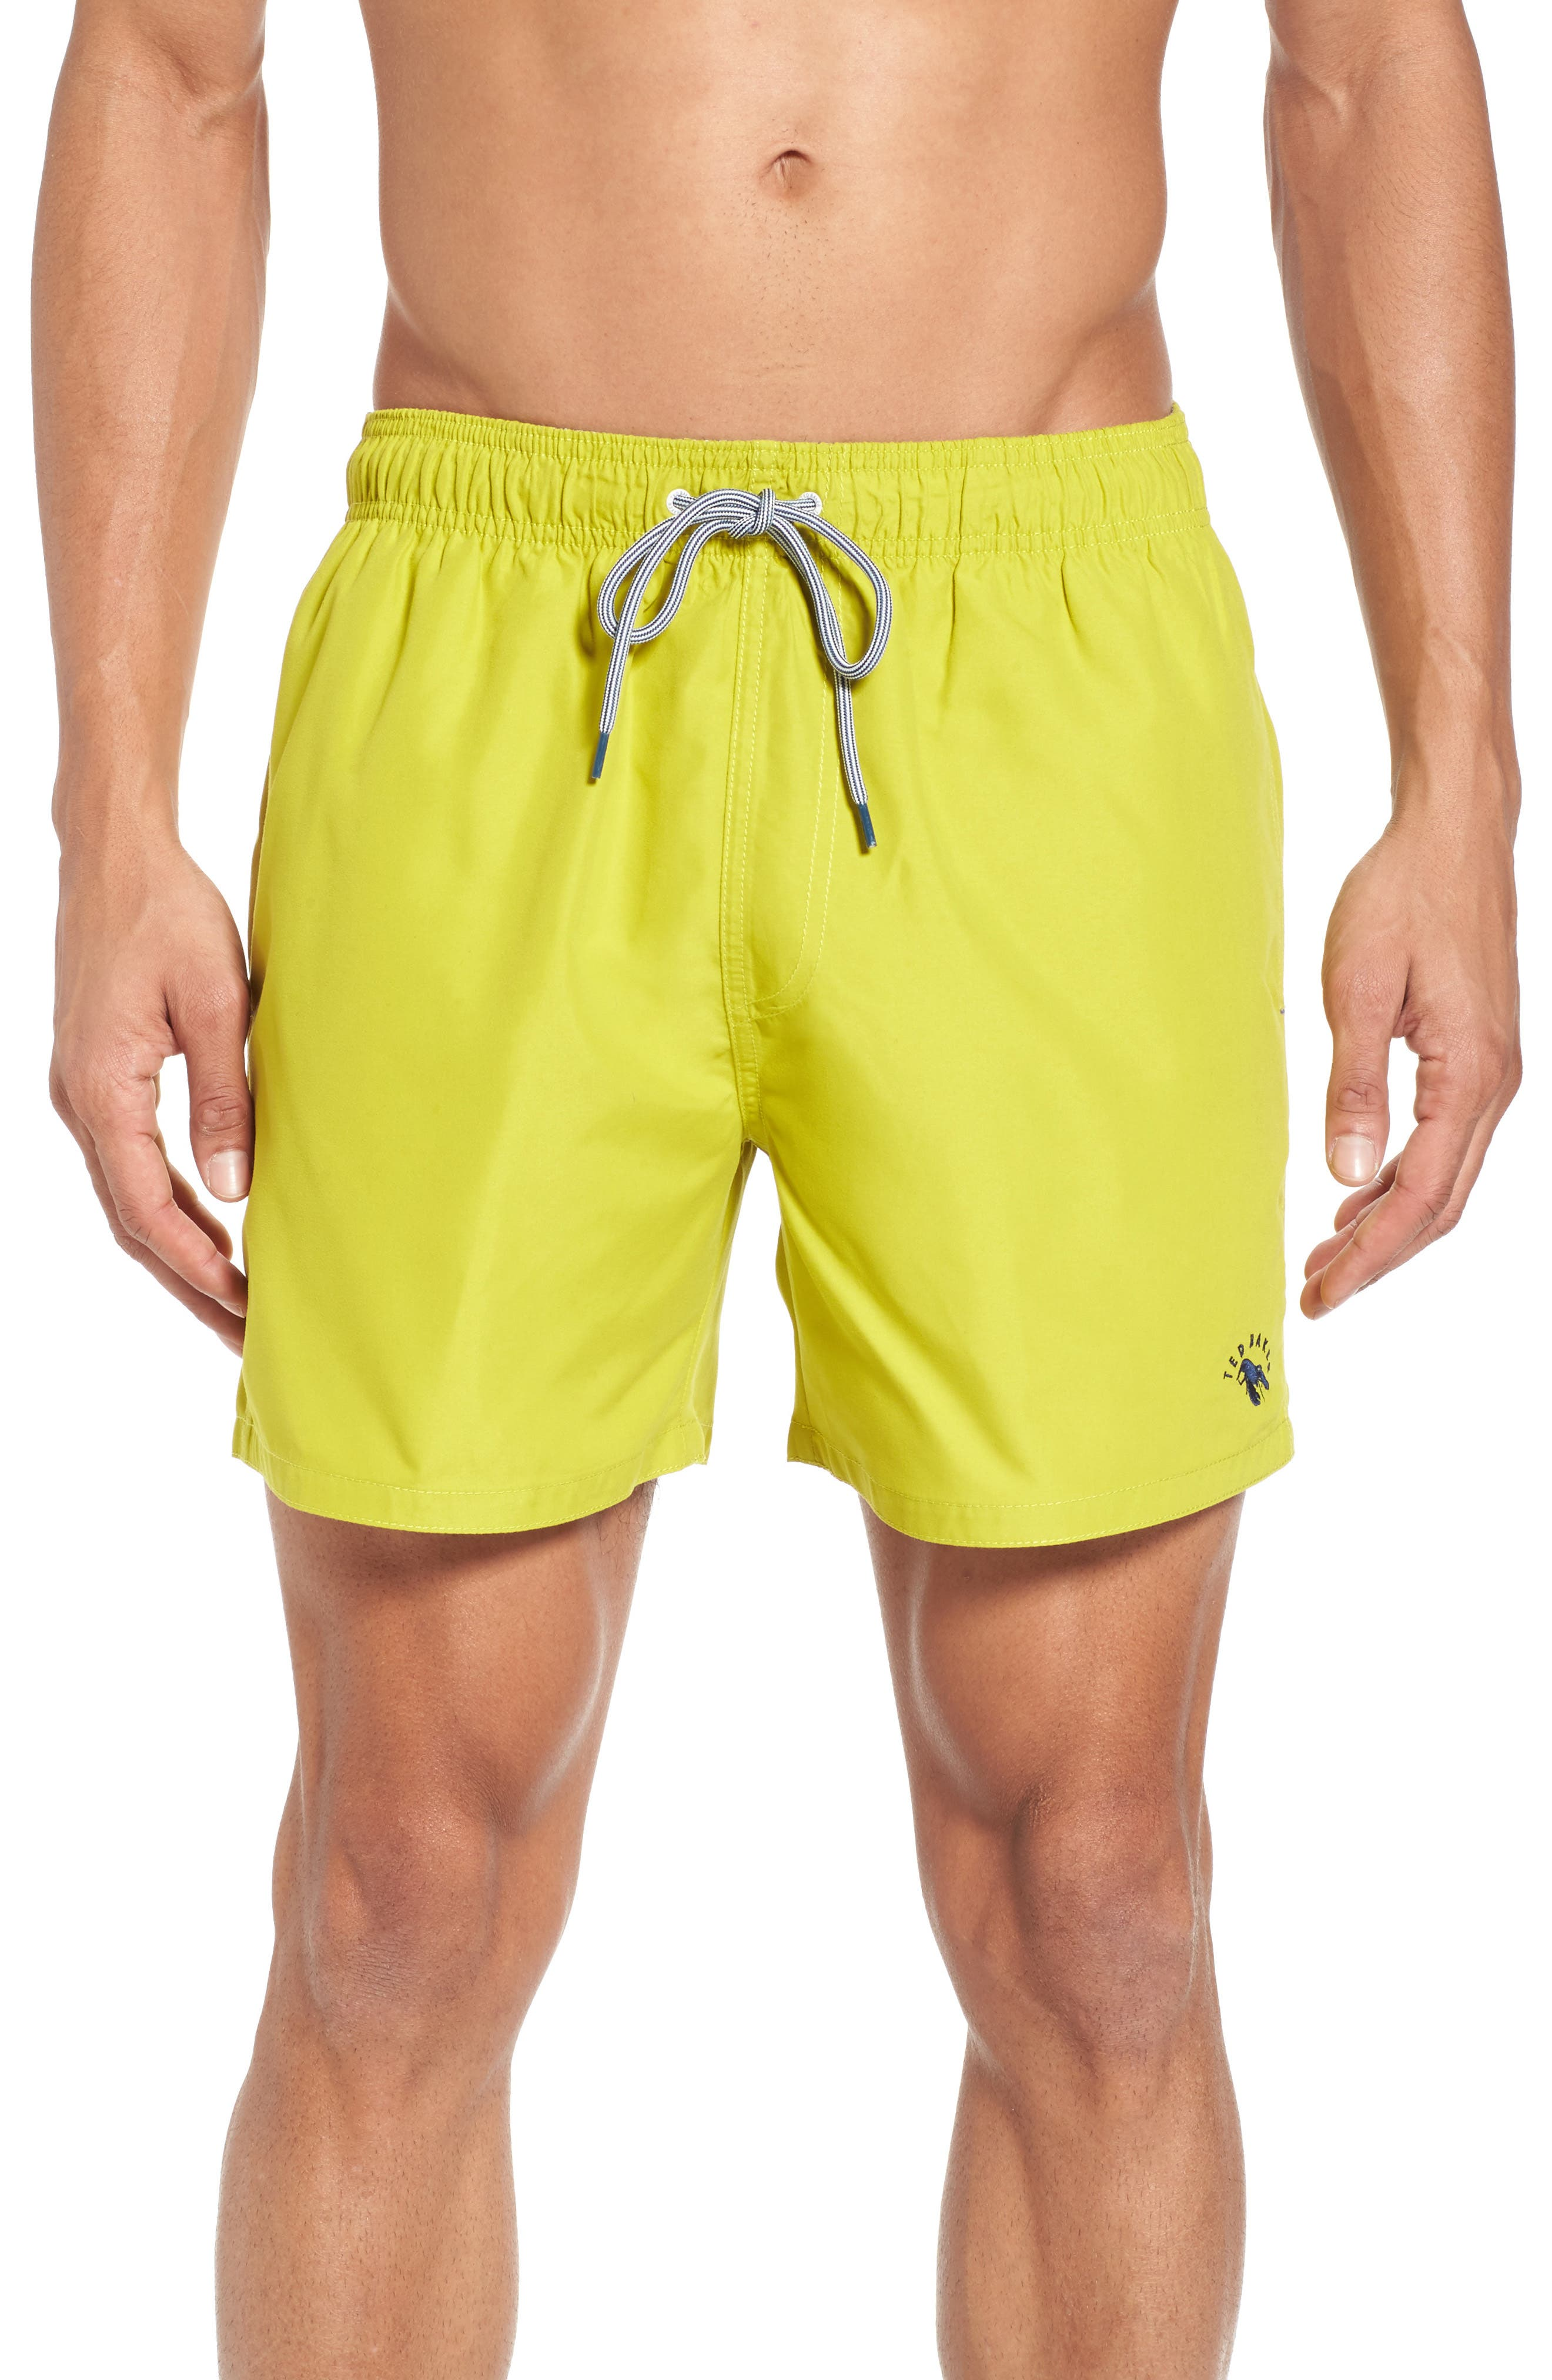 Danbury Swim Shorts,                         Main,                         color, 303